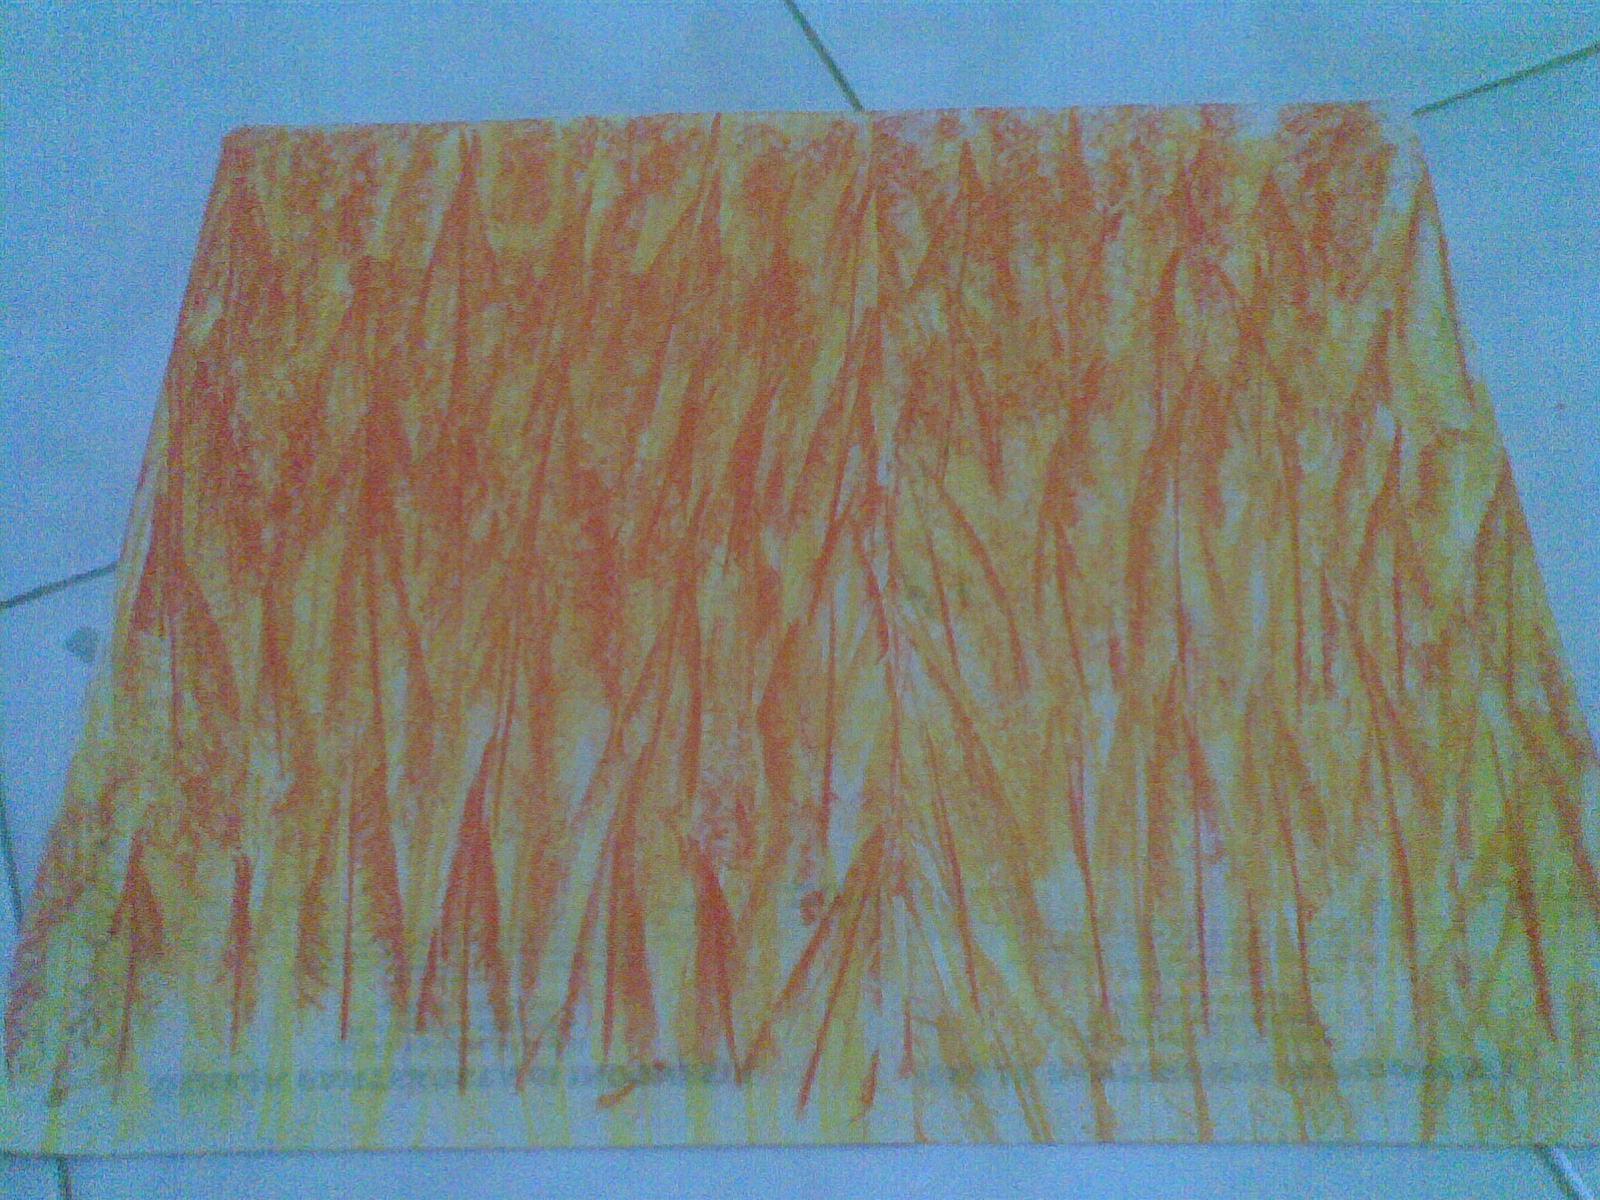 Dua lembar kertas kobaran api yg didekatkan